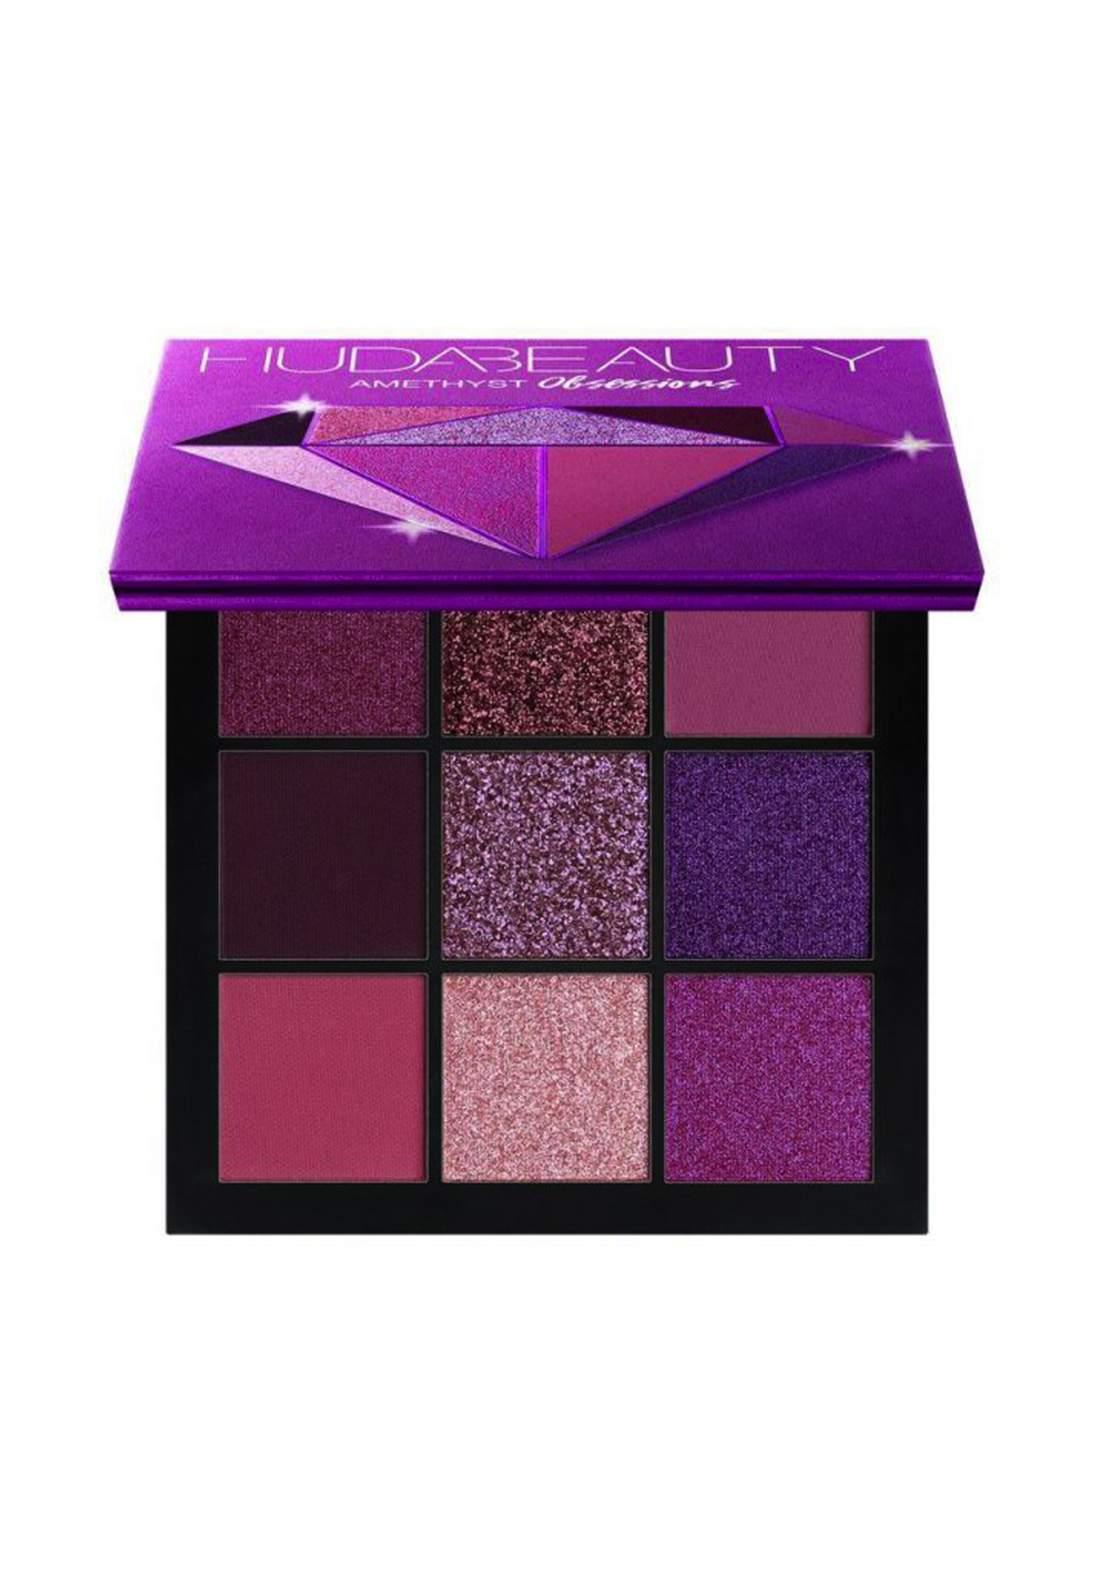 Huda Beauty Obsessions Eyeshadow Palette Amethyst 10g علبة ظلال